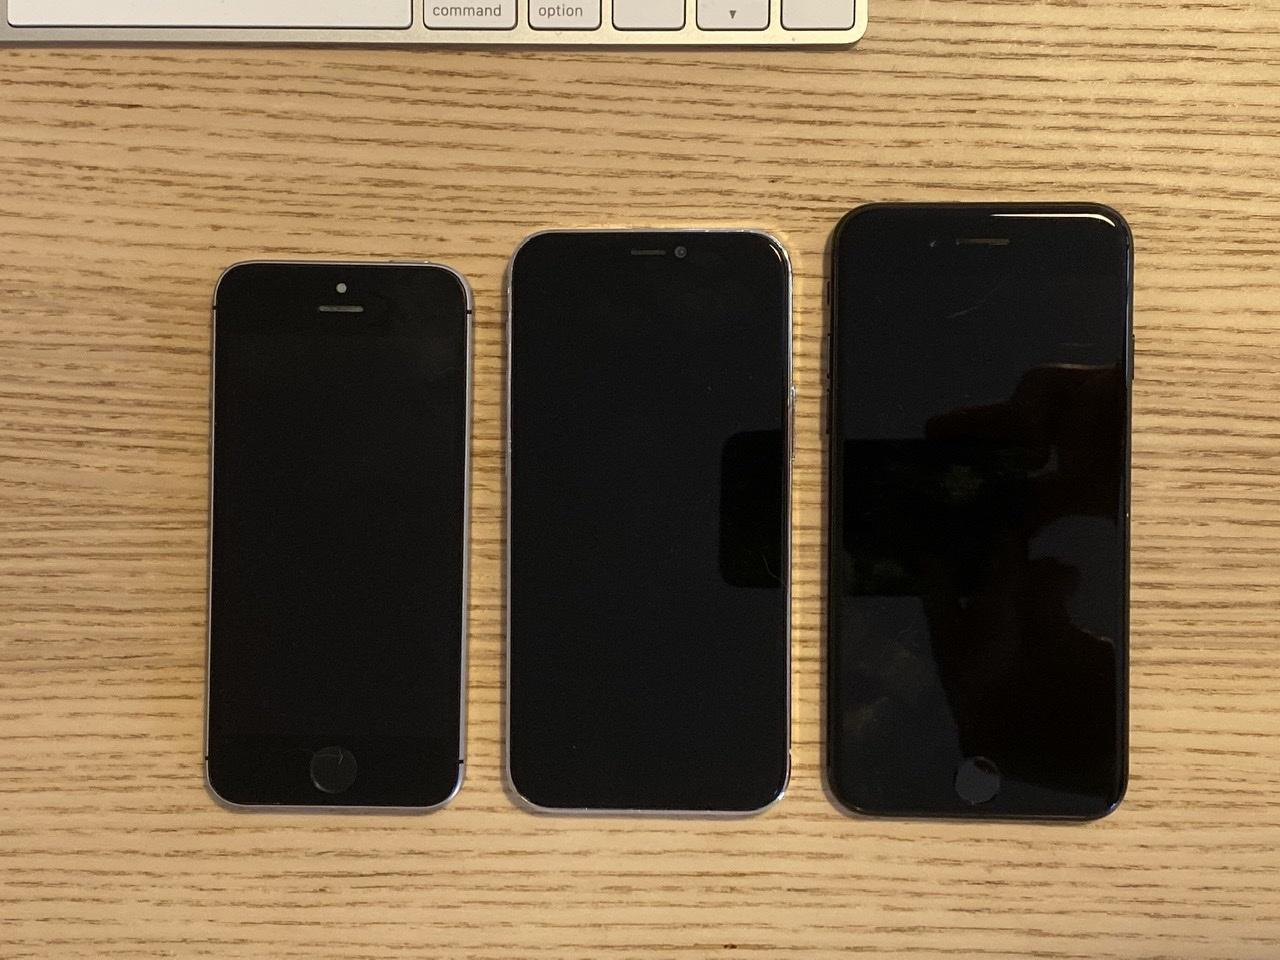 5.4 英寸苹果 iPhone 12 机模对比 iPhone SE/7